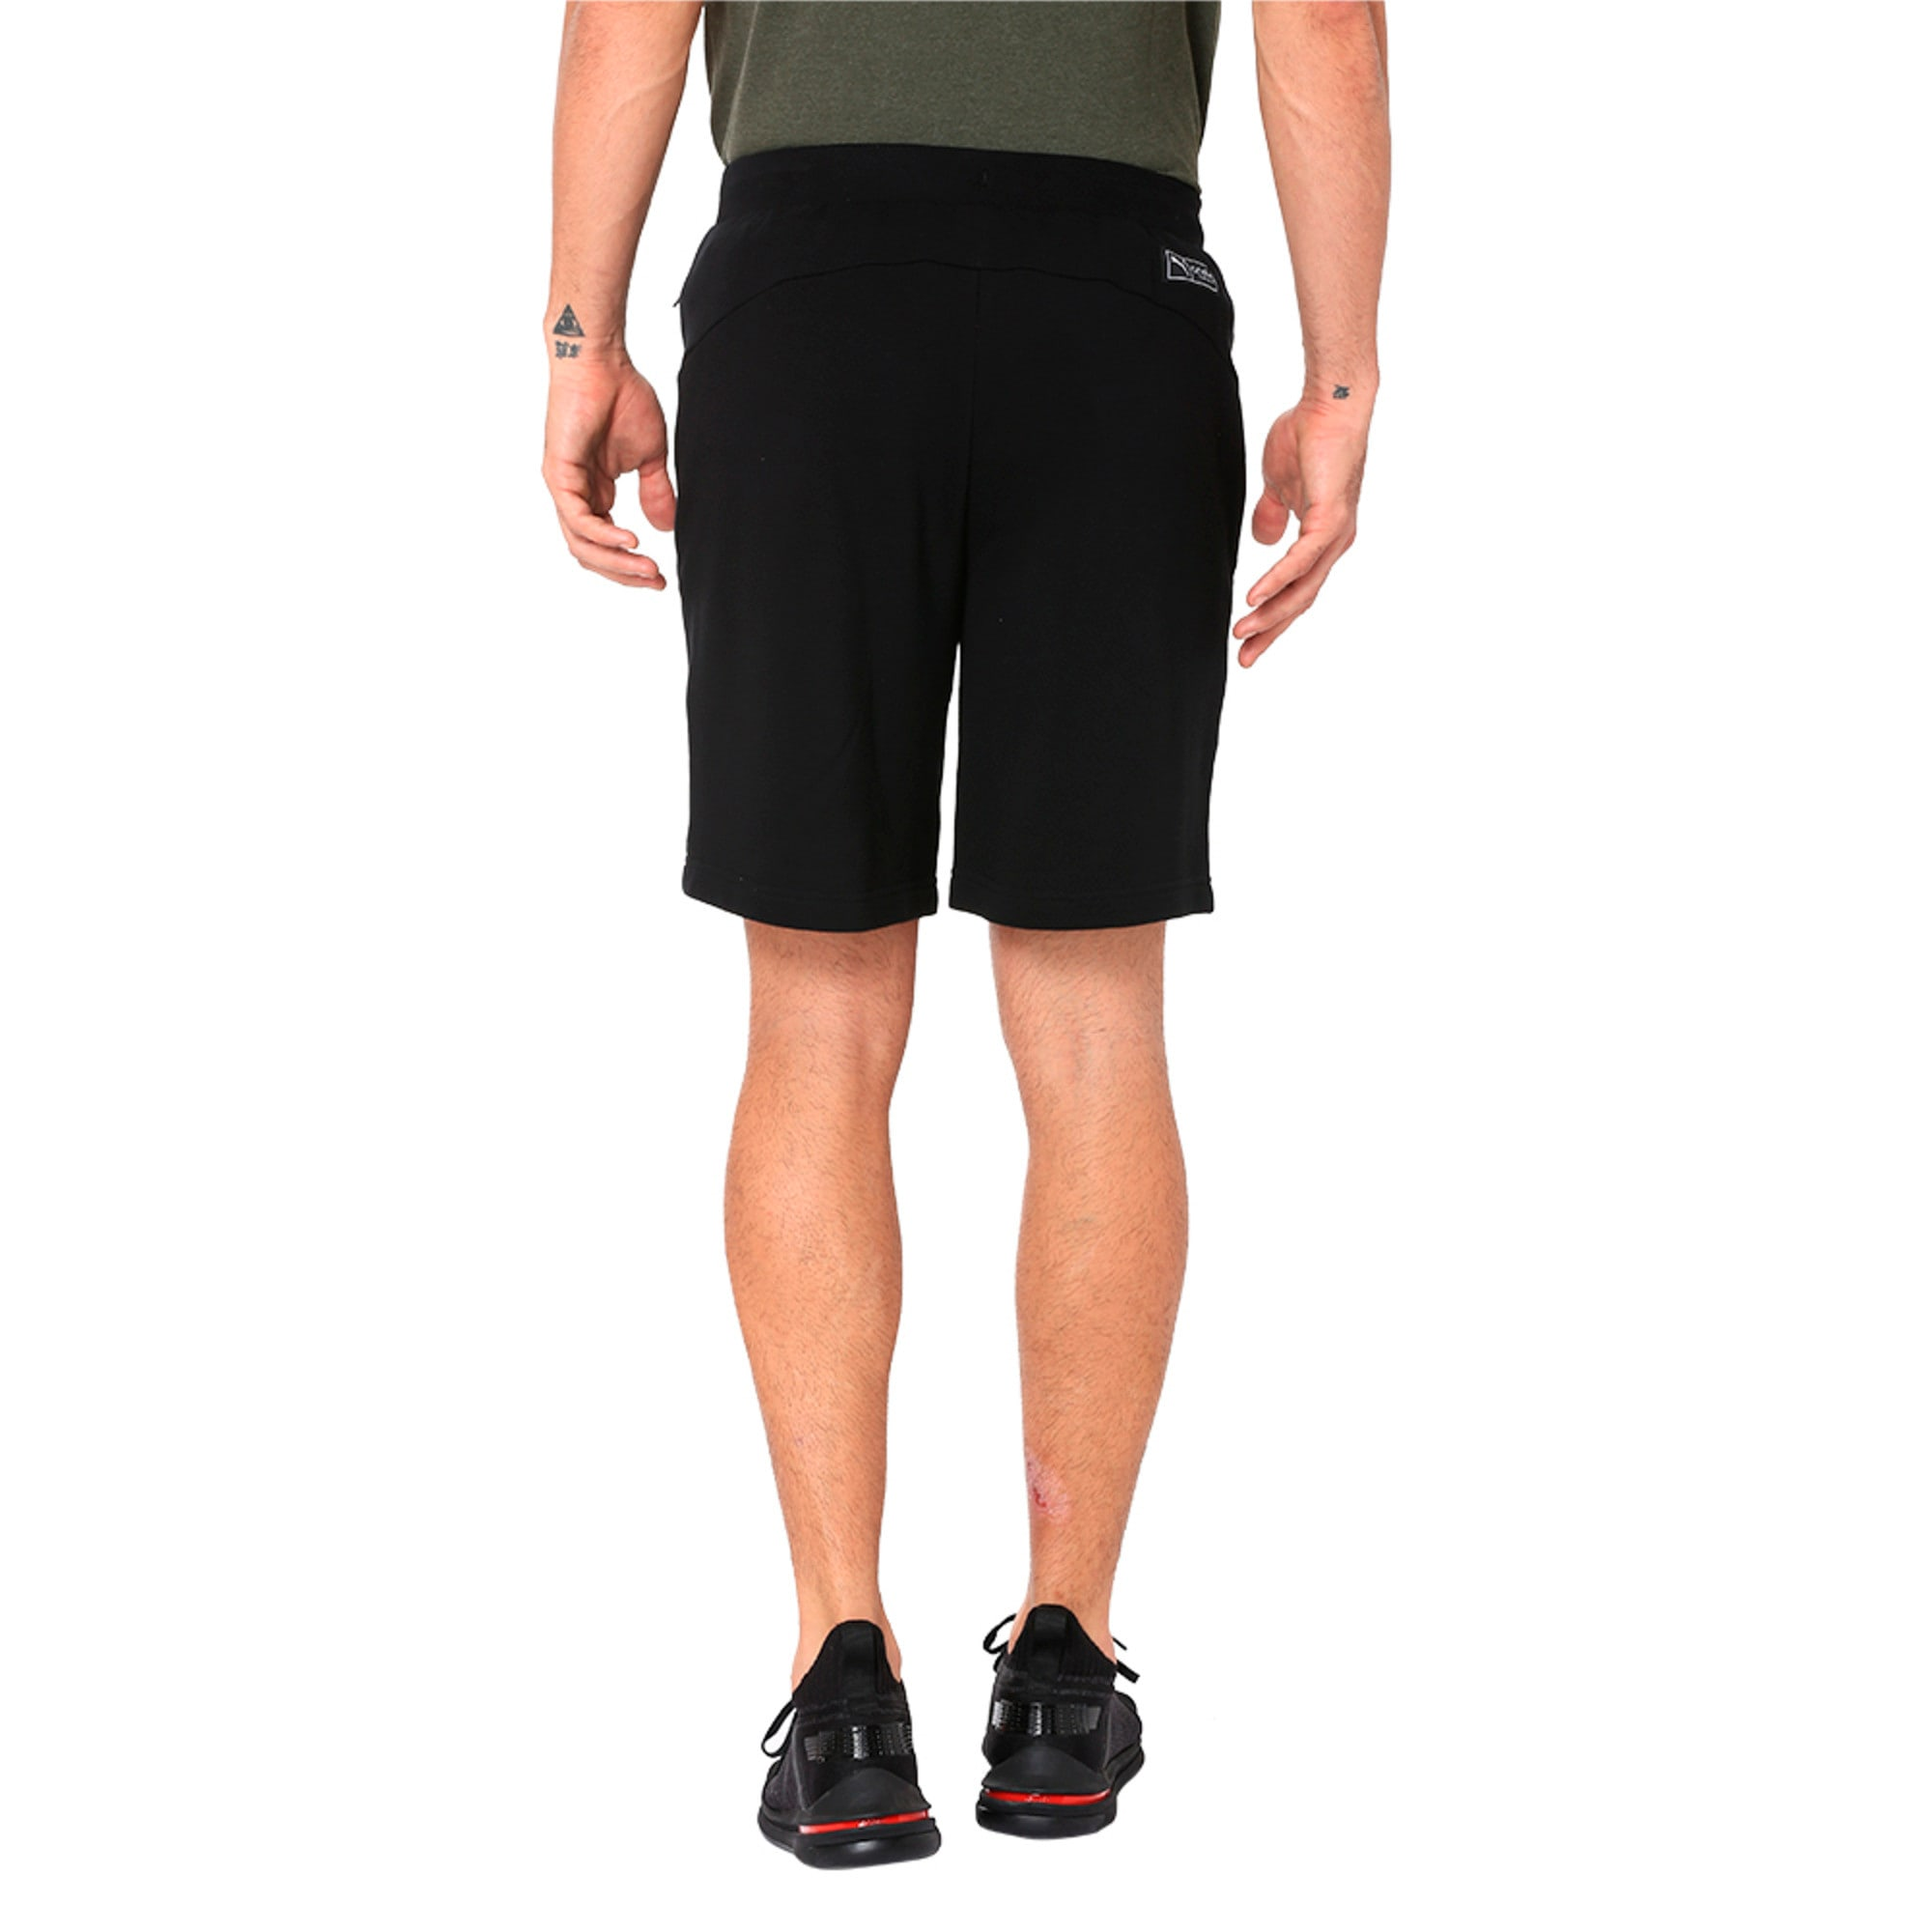 Thumbnail 2 of One8 VK Men's Sweat Shorts, Puma Black, medium-IND